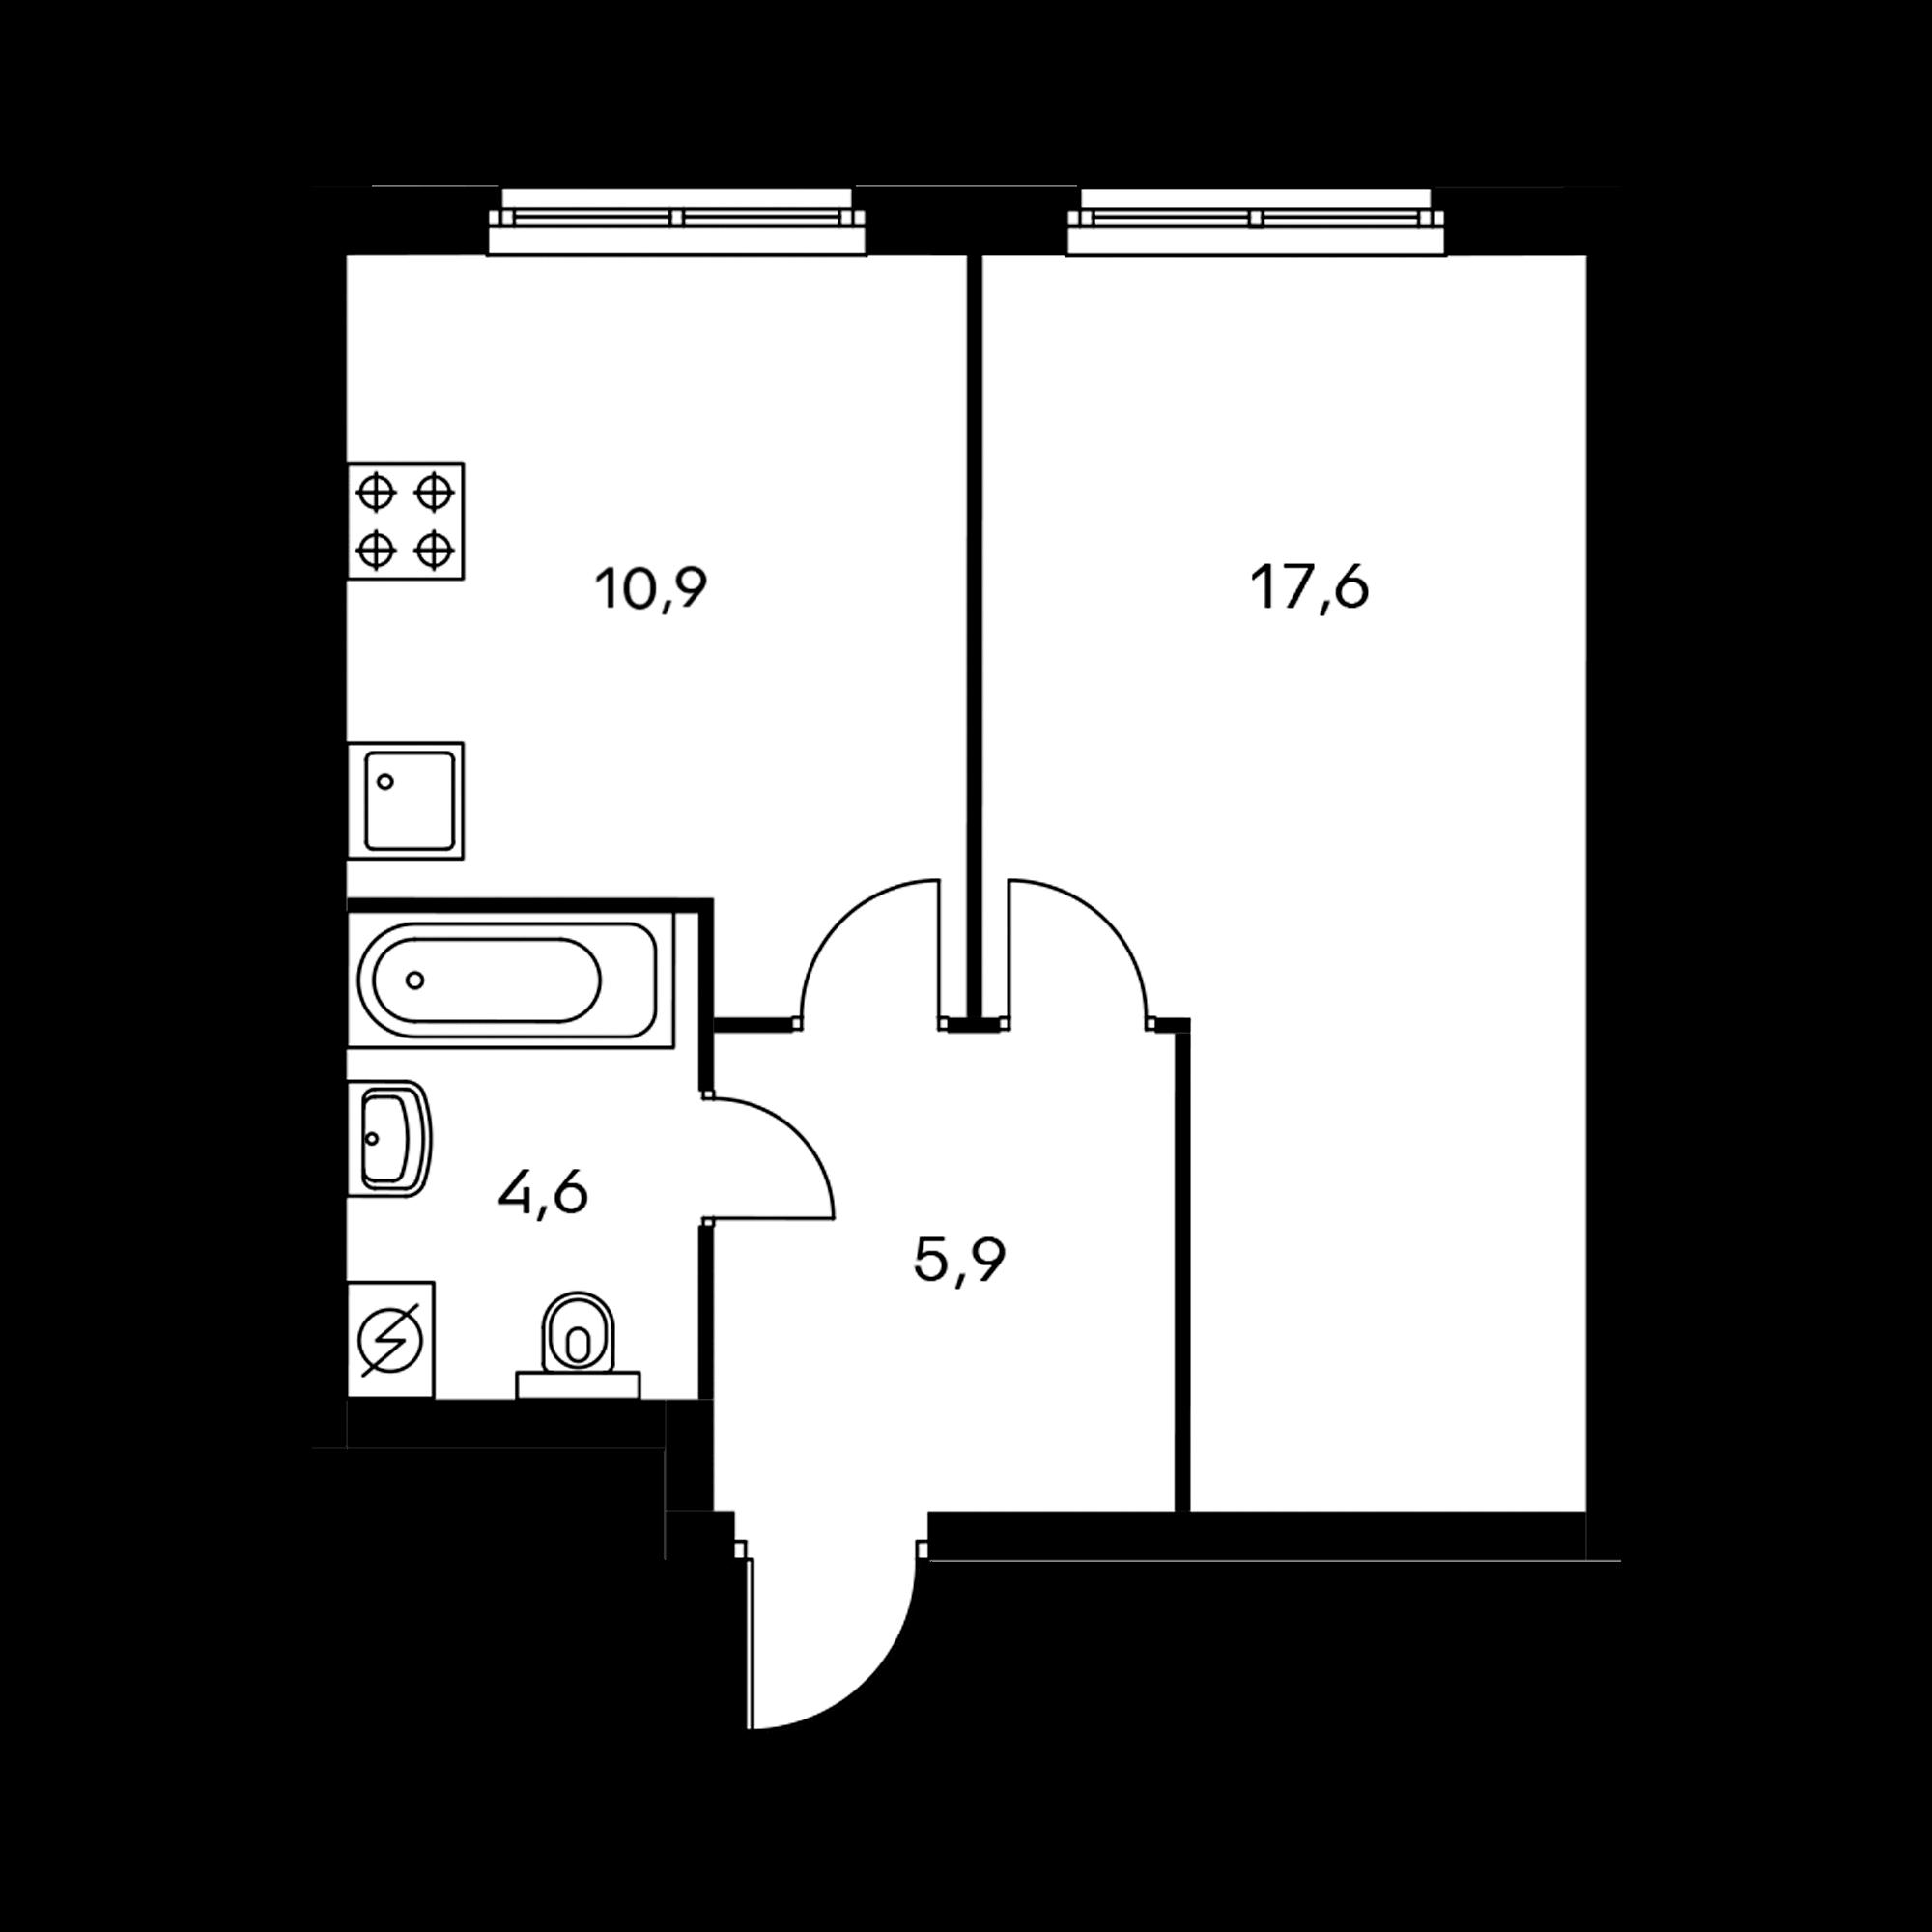 1KM1_6.6-3